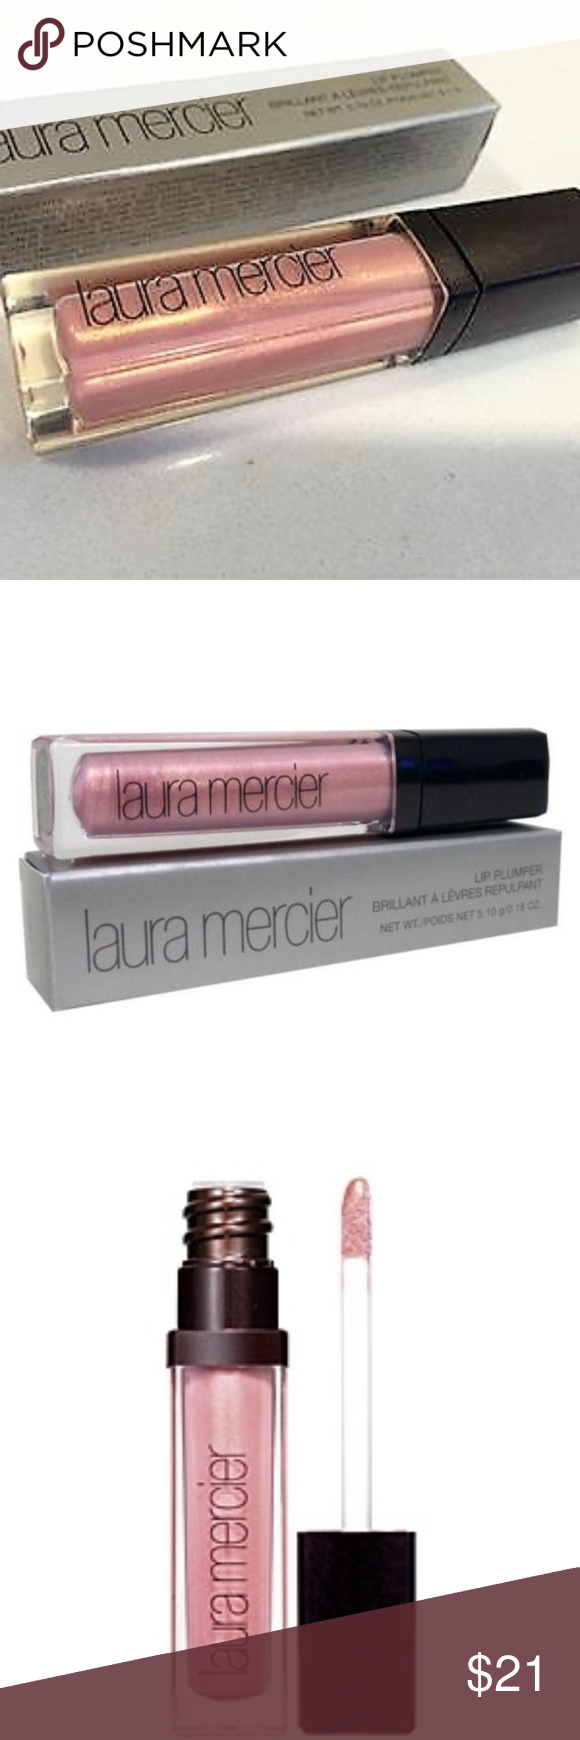 Last One Nib Lip Plumper Pink Pearl Laura Mercier Boutique Lip Plumper Lip Moisturizer Pink Pearl